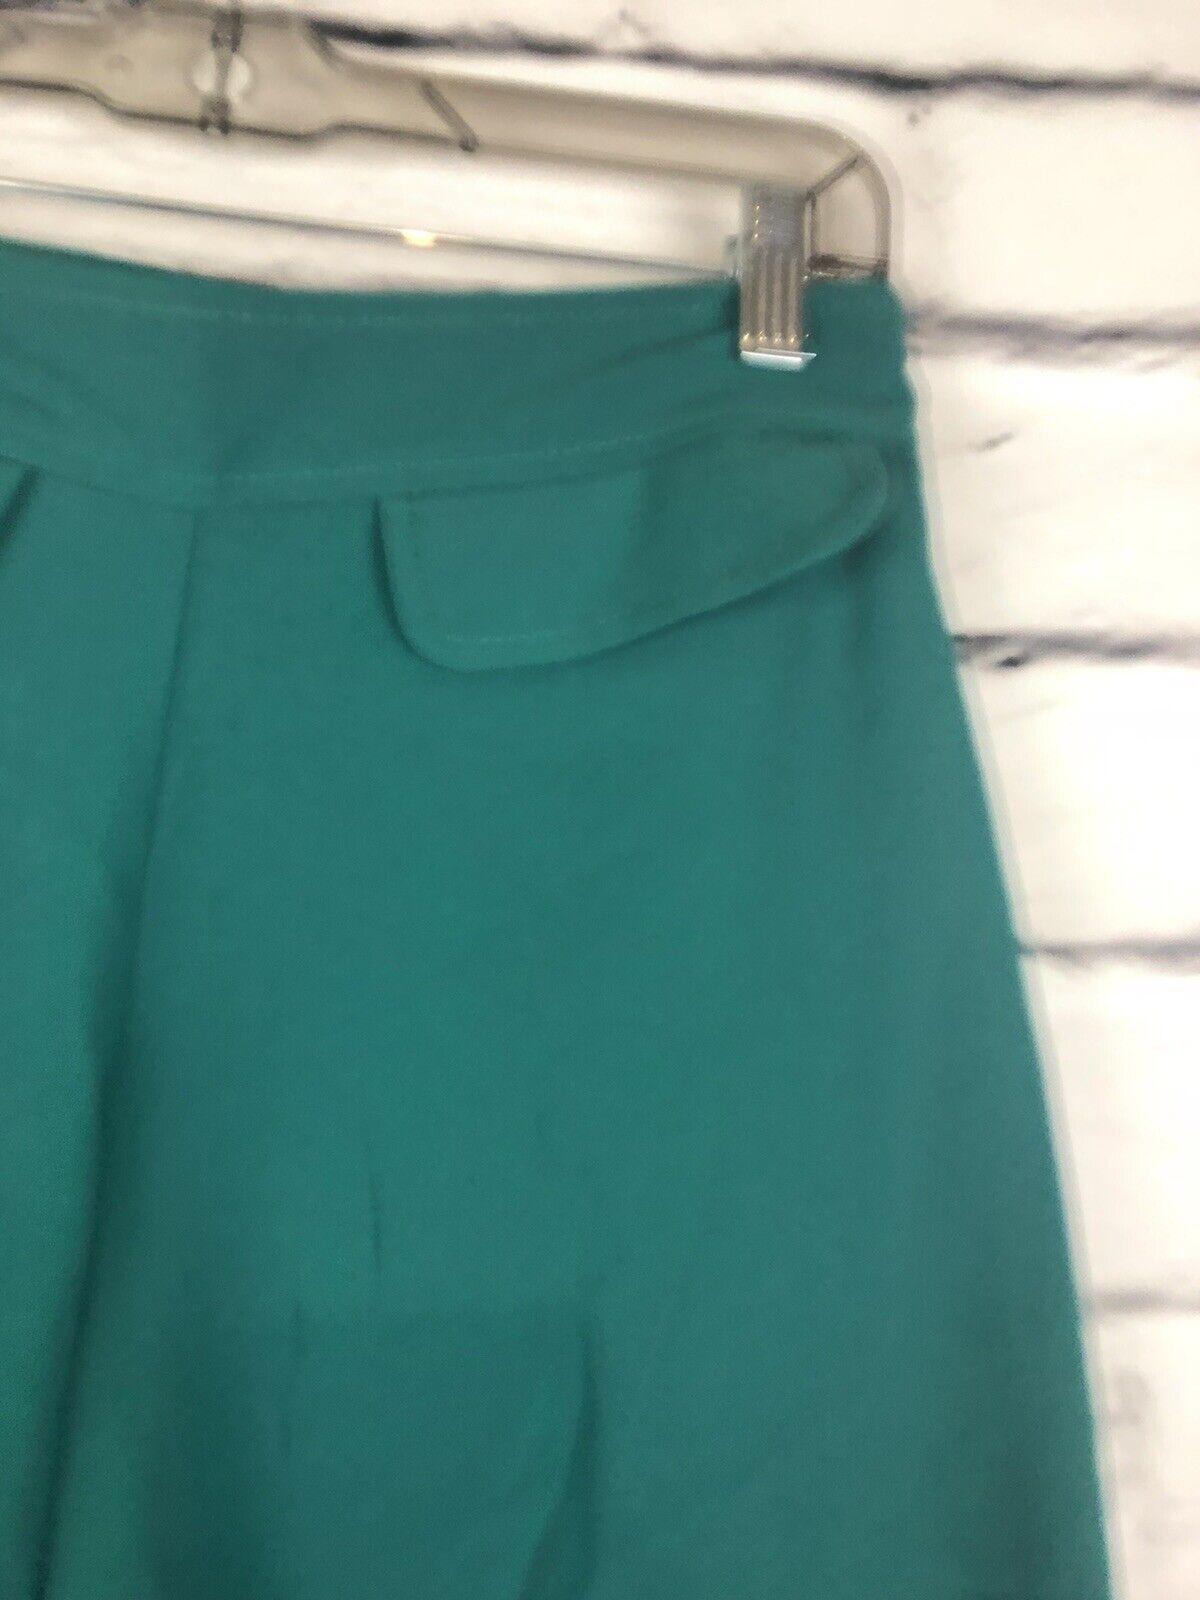 Trina Turk Womens Teal Size 12 Gaucho Pants  - image 4